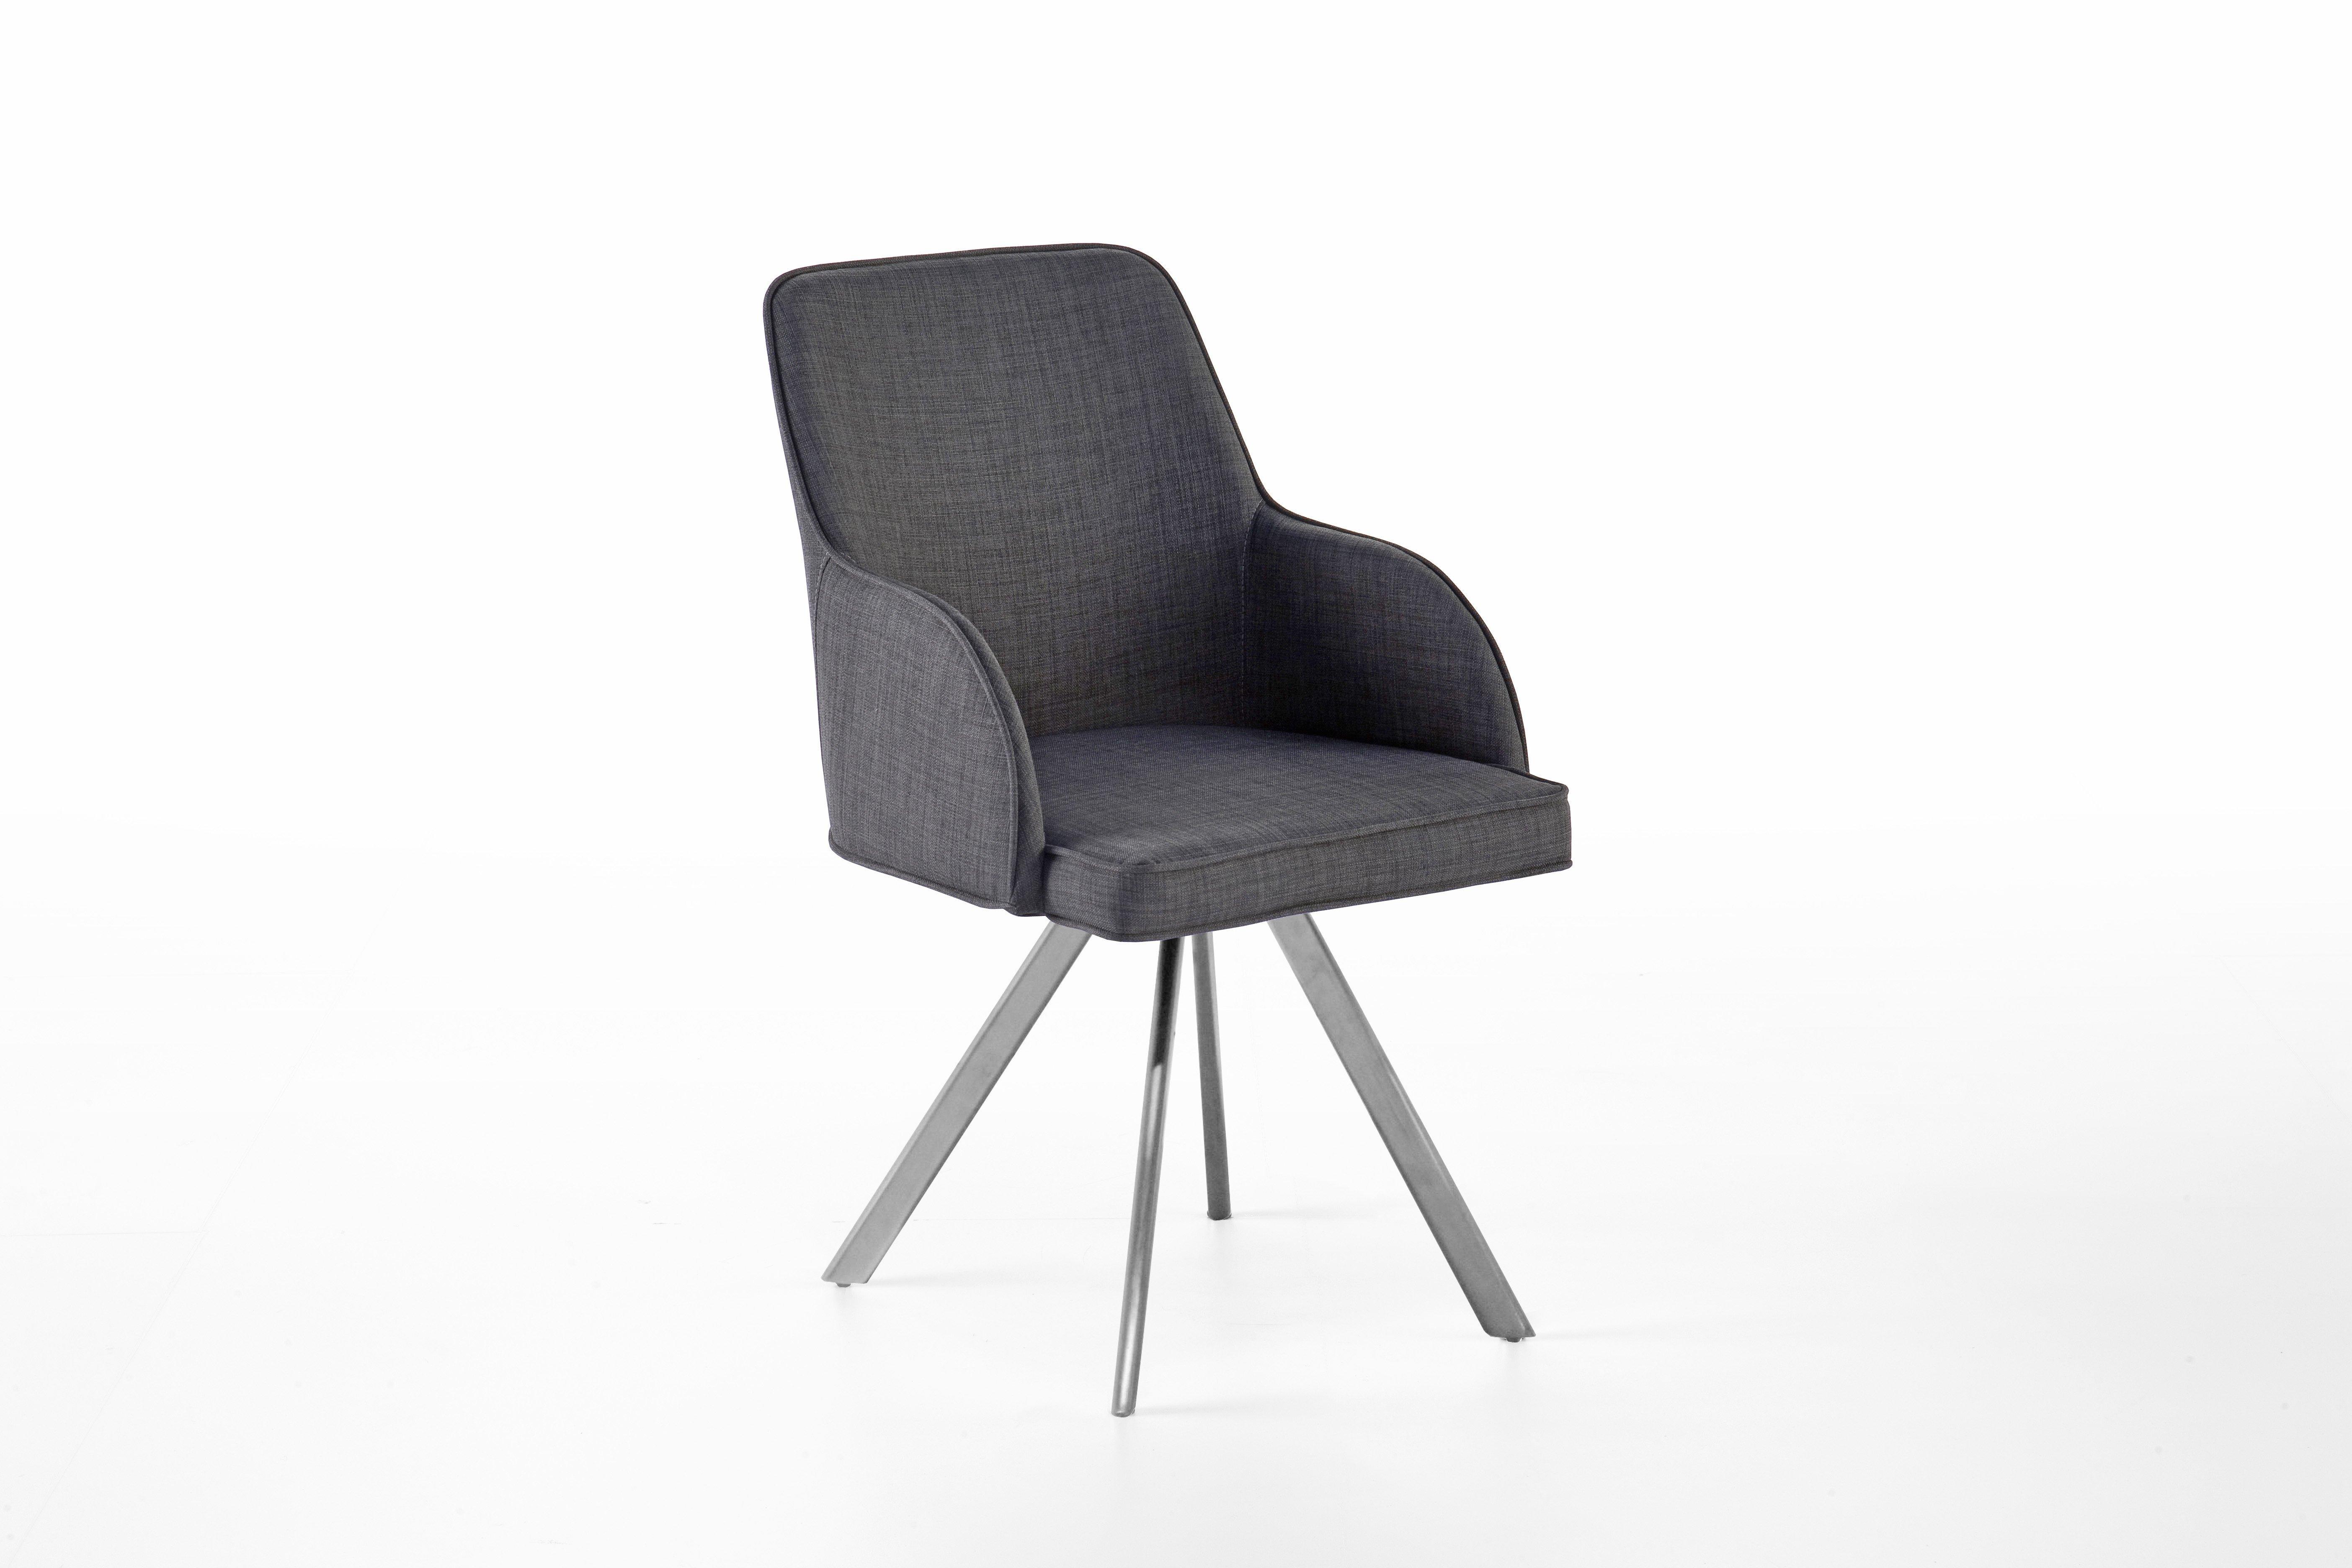 Stuhlsystem Elara C von MCA